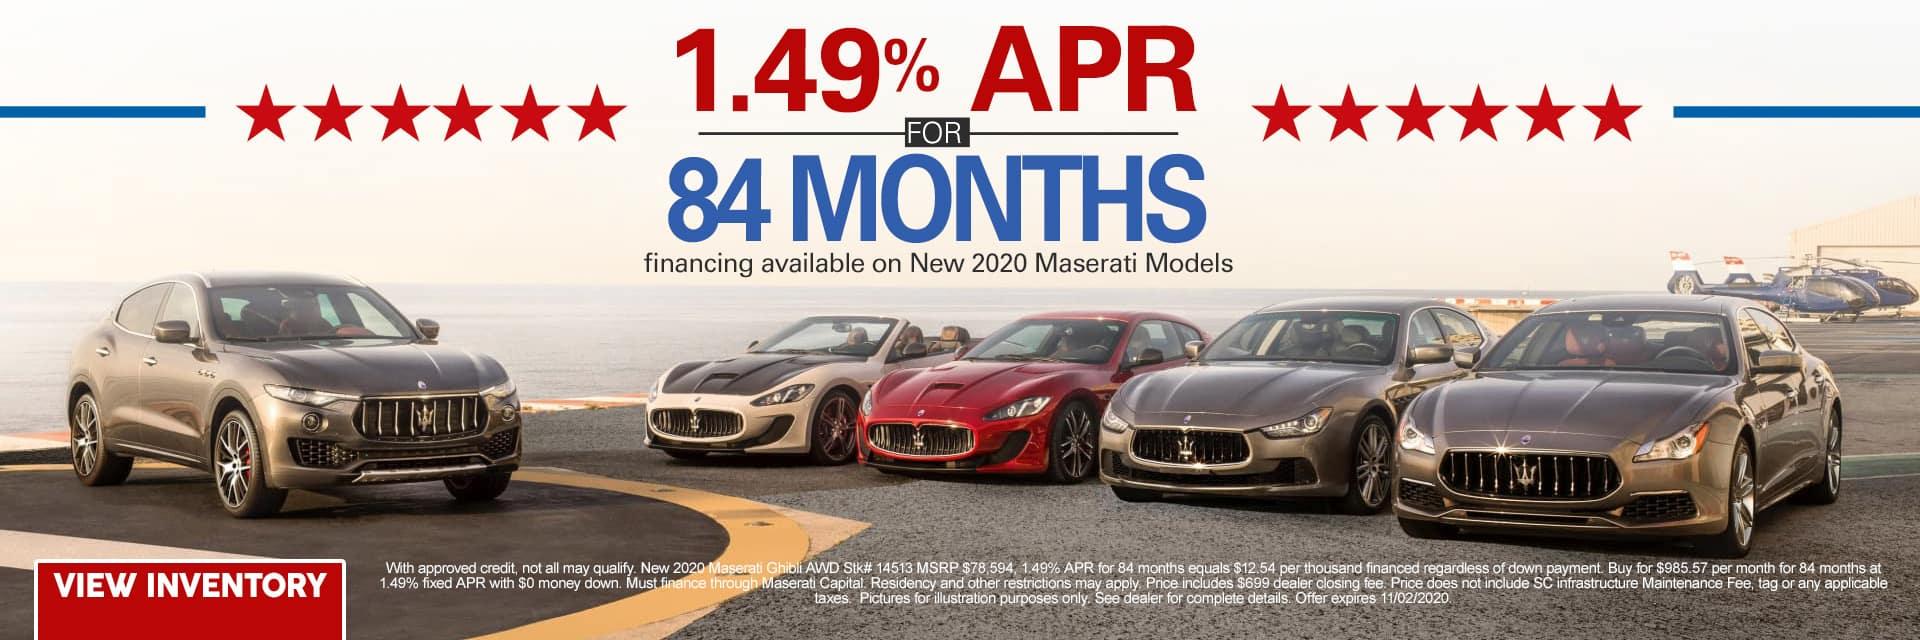 SLAM80451-02-October-2020-Web-Campaign-Maserati-slide-apr